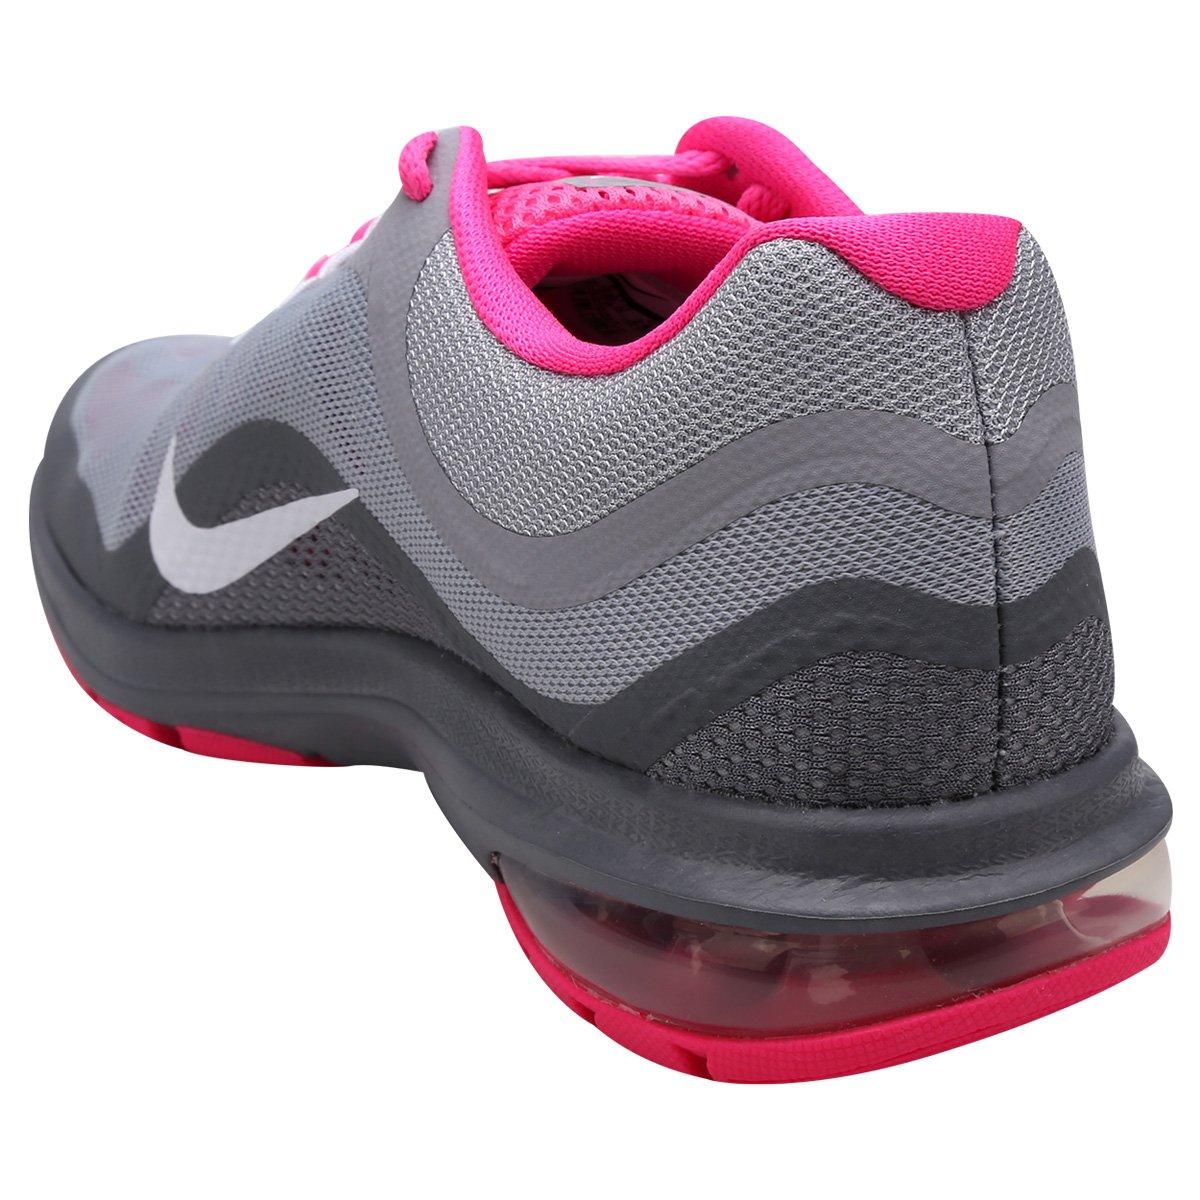 Tênis Nike Air Max Dynasty 2 Feminino - Grafite e Pink - Compre ... d94834c59048a